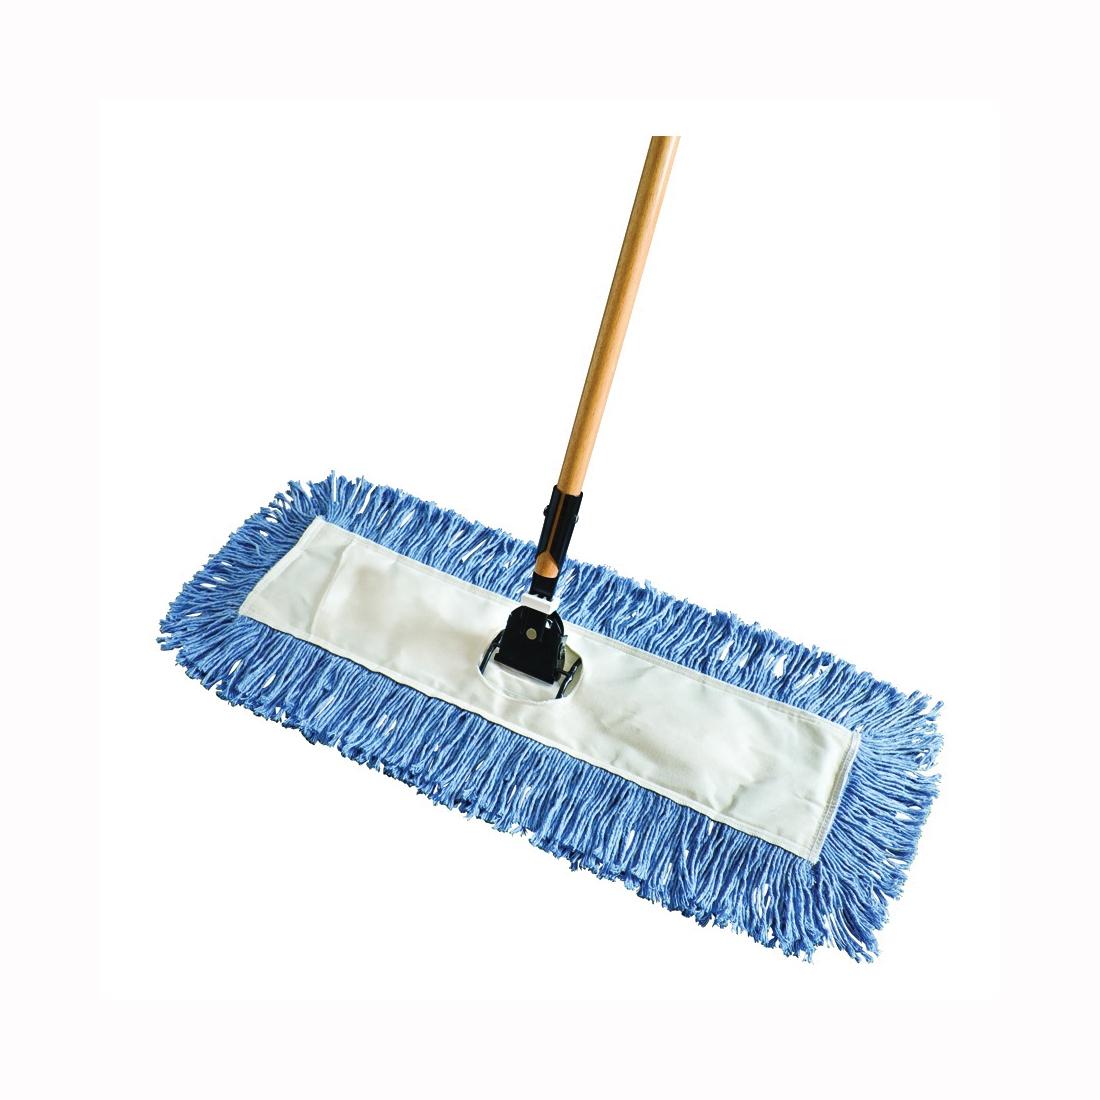 Picture of Rubbermaid FGU83228BL00 Dust Mop, Cotton Head, Wood Handle, 66.4 in L, Blue